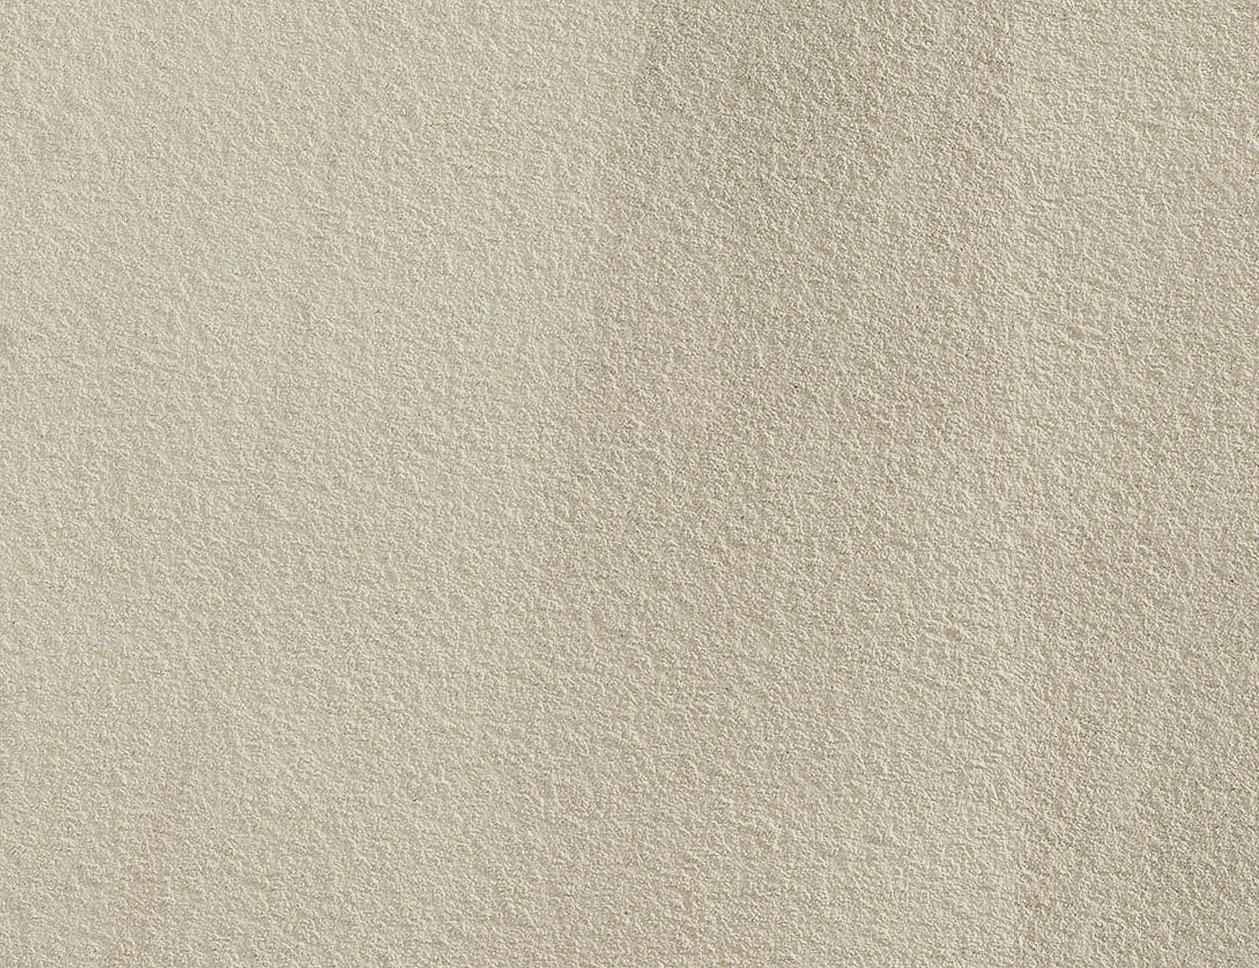 Porcelain Ceramic Tiles For Floors Walls Mirage